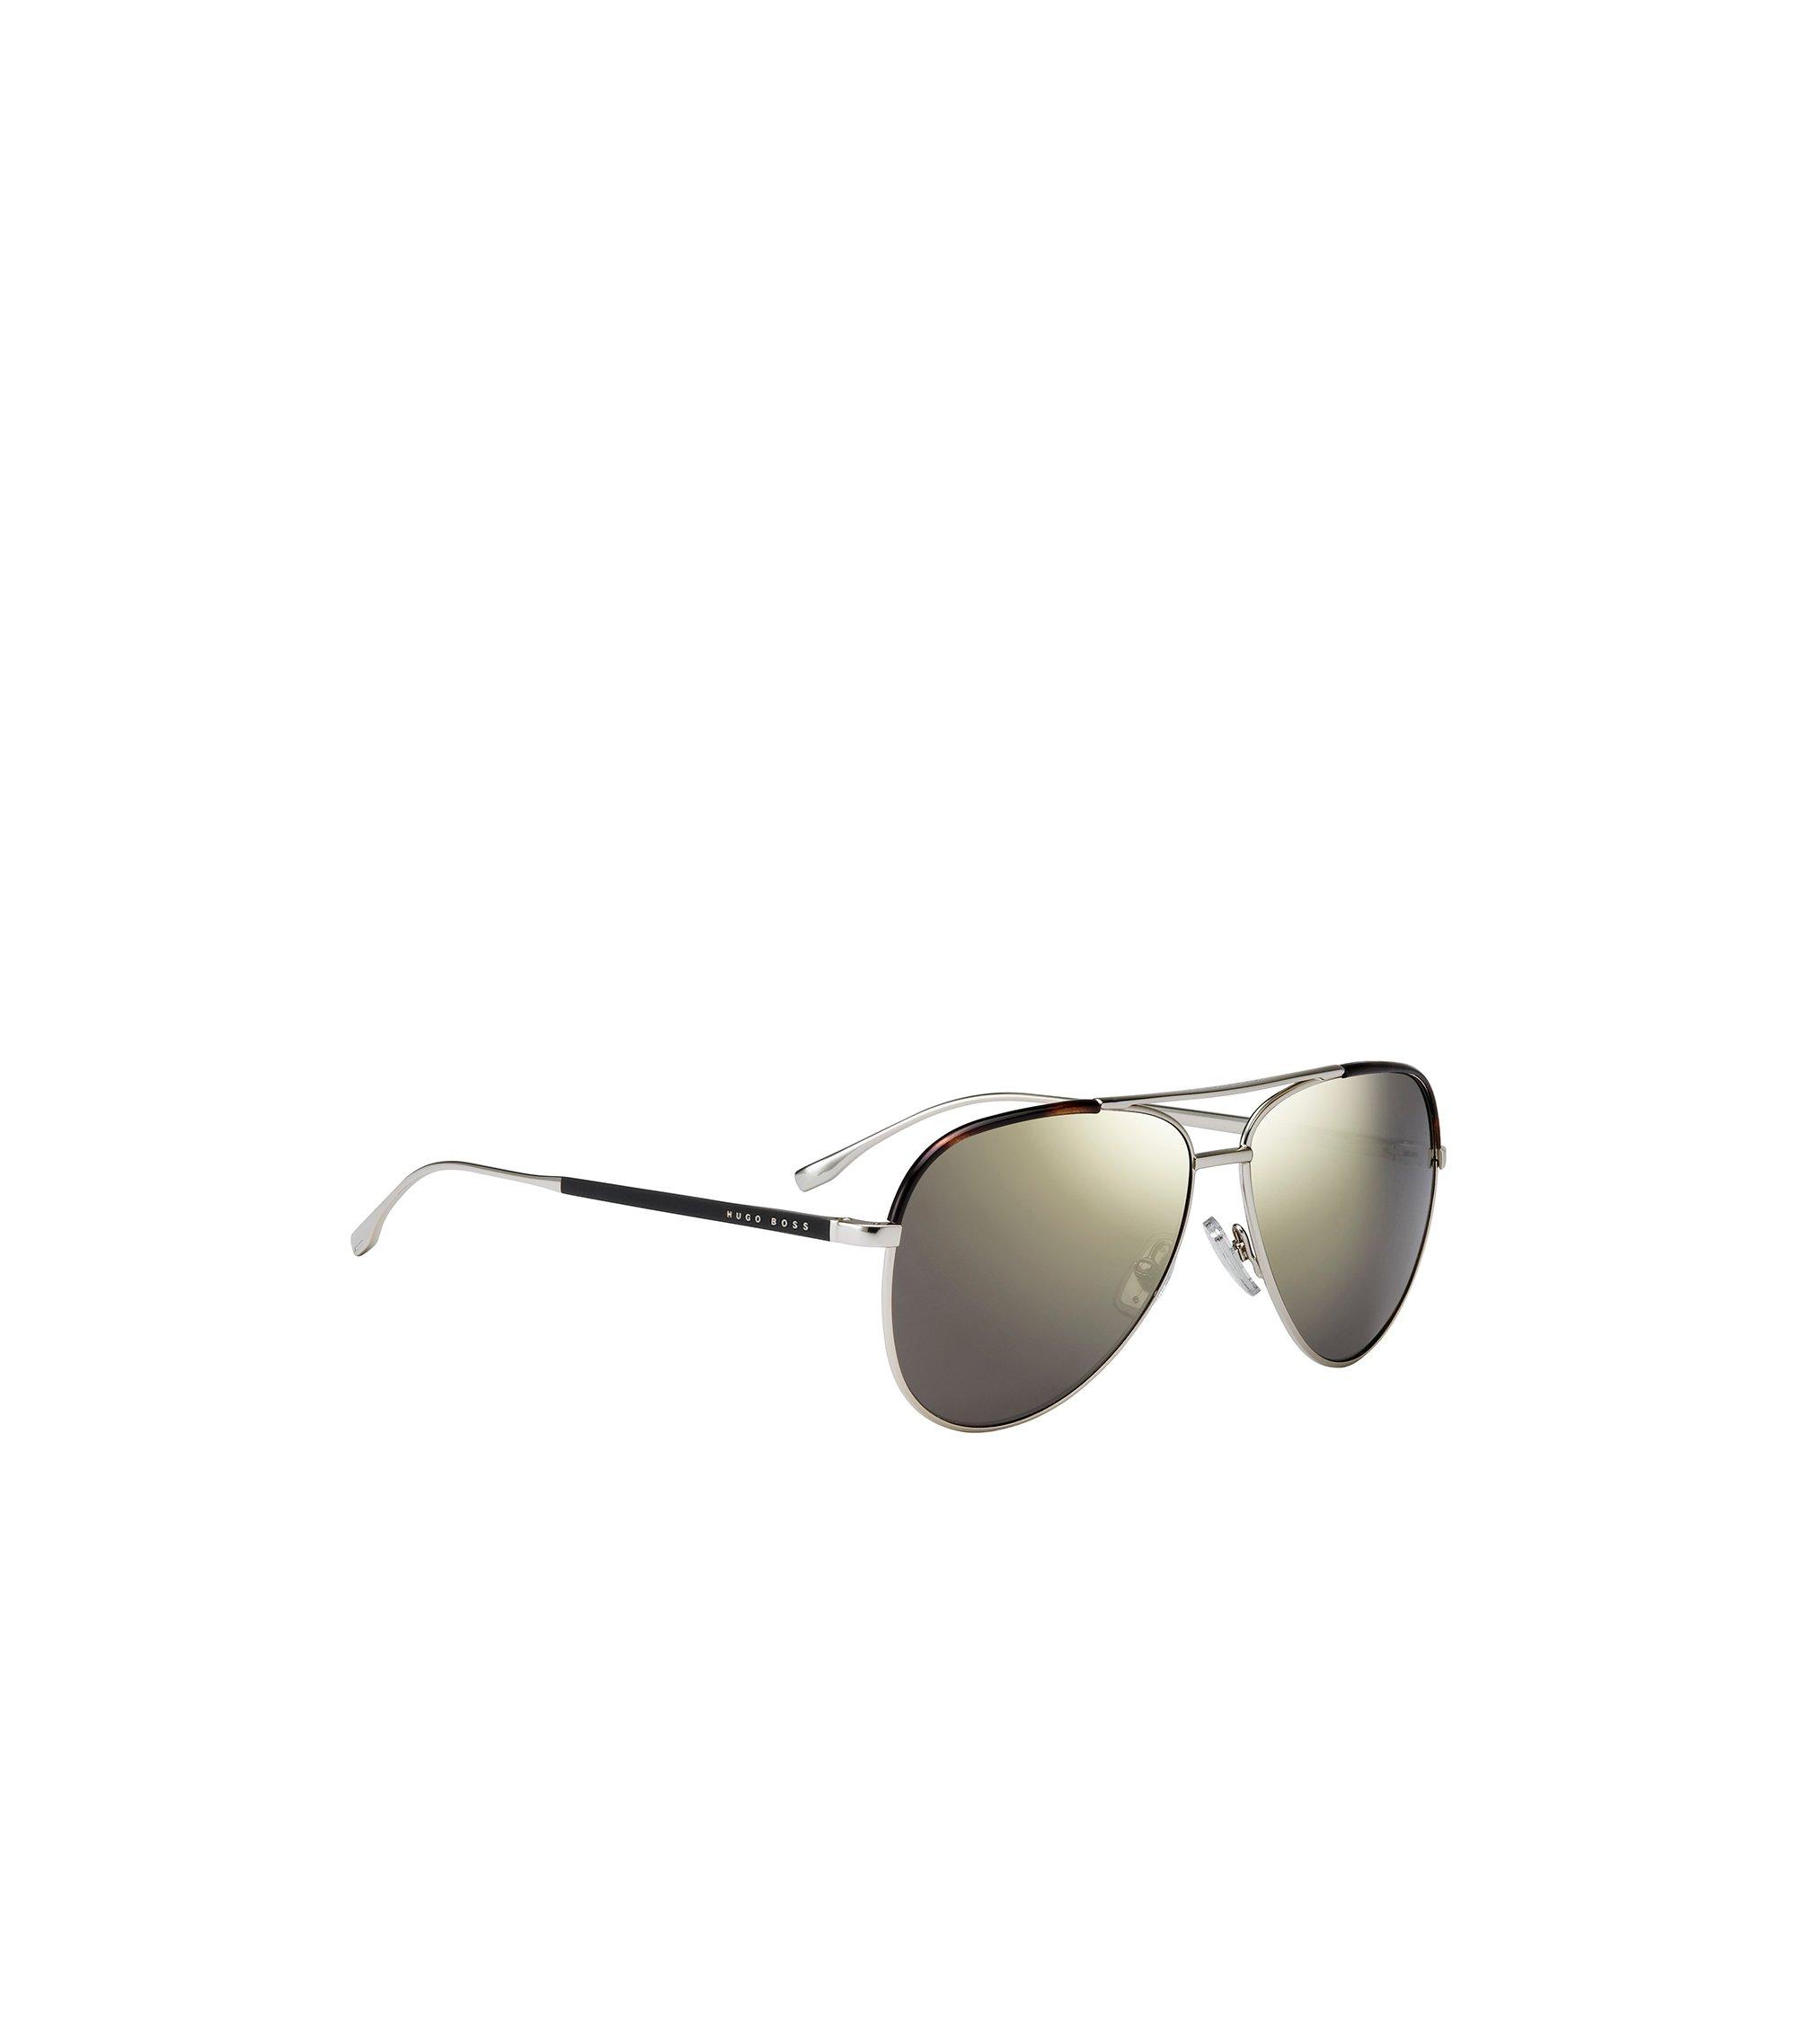 Piloten-Sonnenbrille mit goldfarbener Metallfassung: 'BOSS 0782/S', Assorted-Pre-Pack